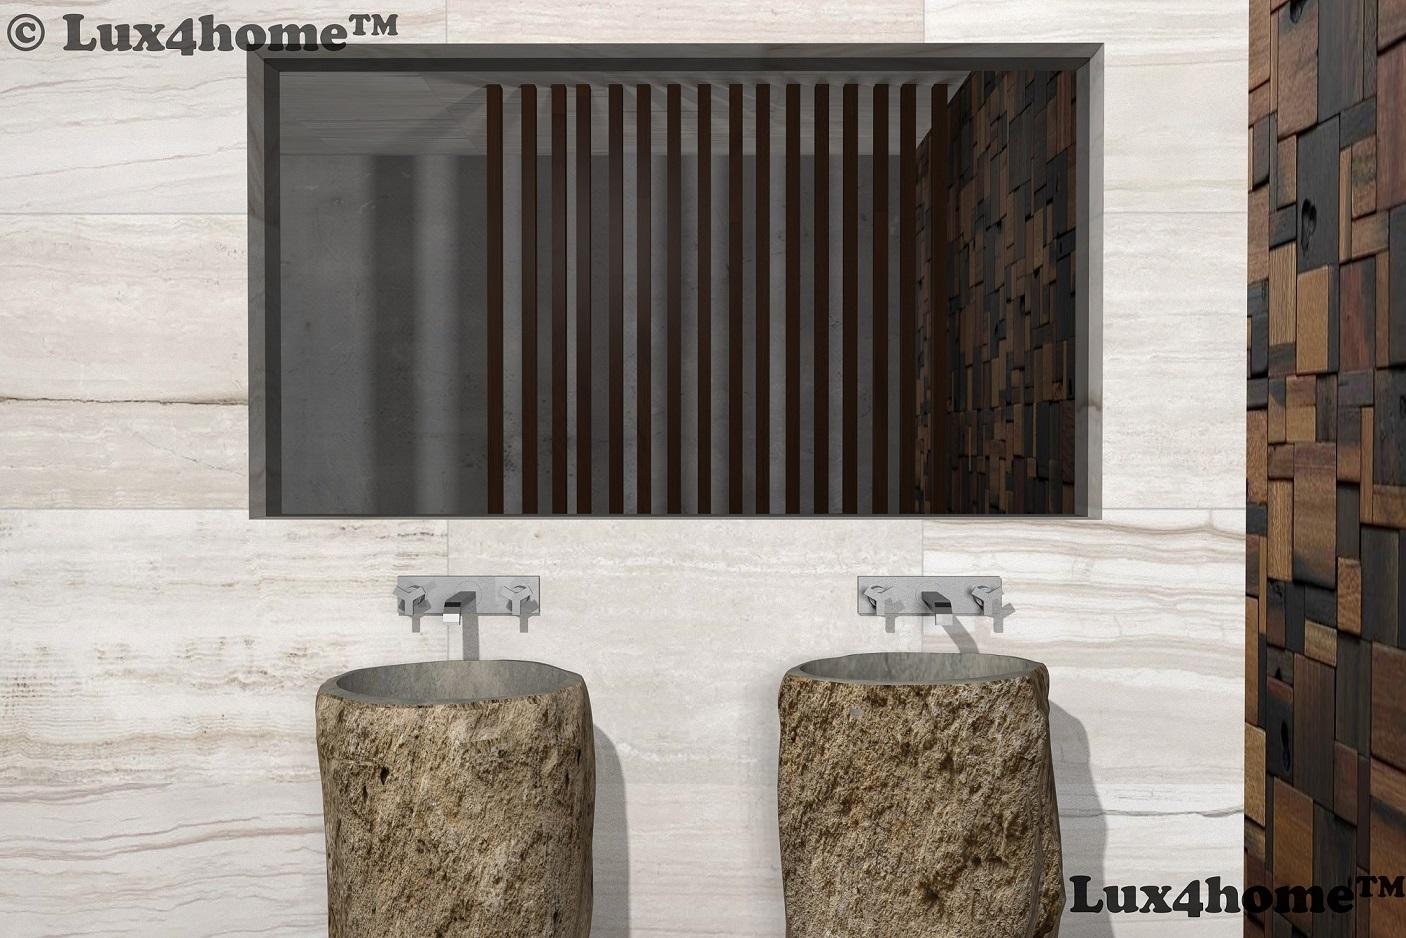 River stone bathtub manufacturer lux4home for Channel 4 bathroom design ideas